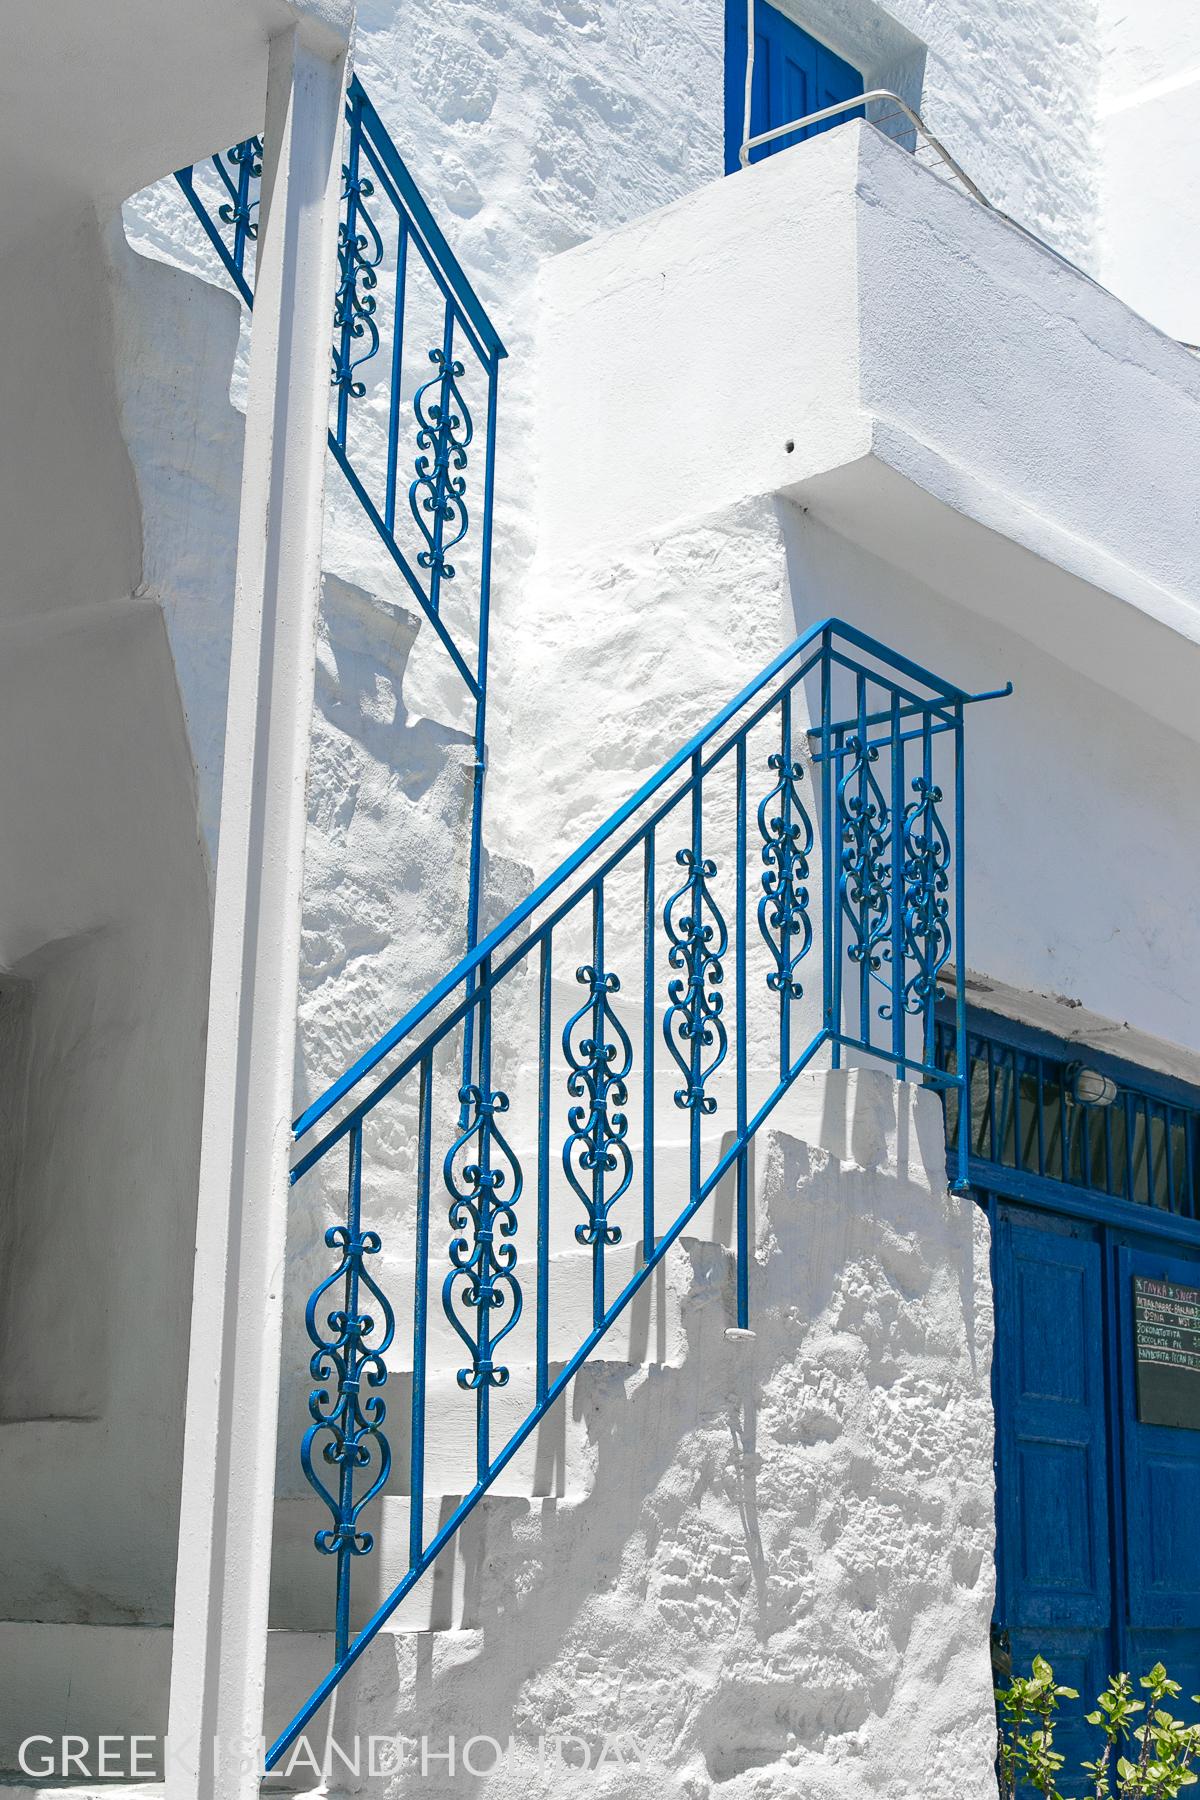 Greek Island Holiday blog Kimolos Chorio blue wrought iron staircase